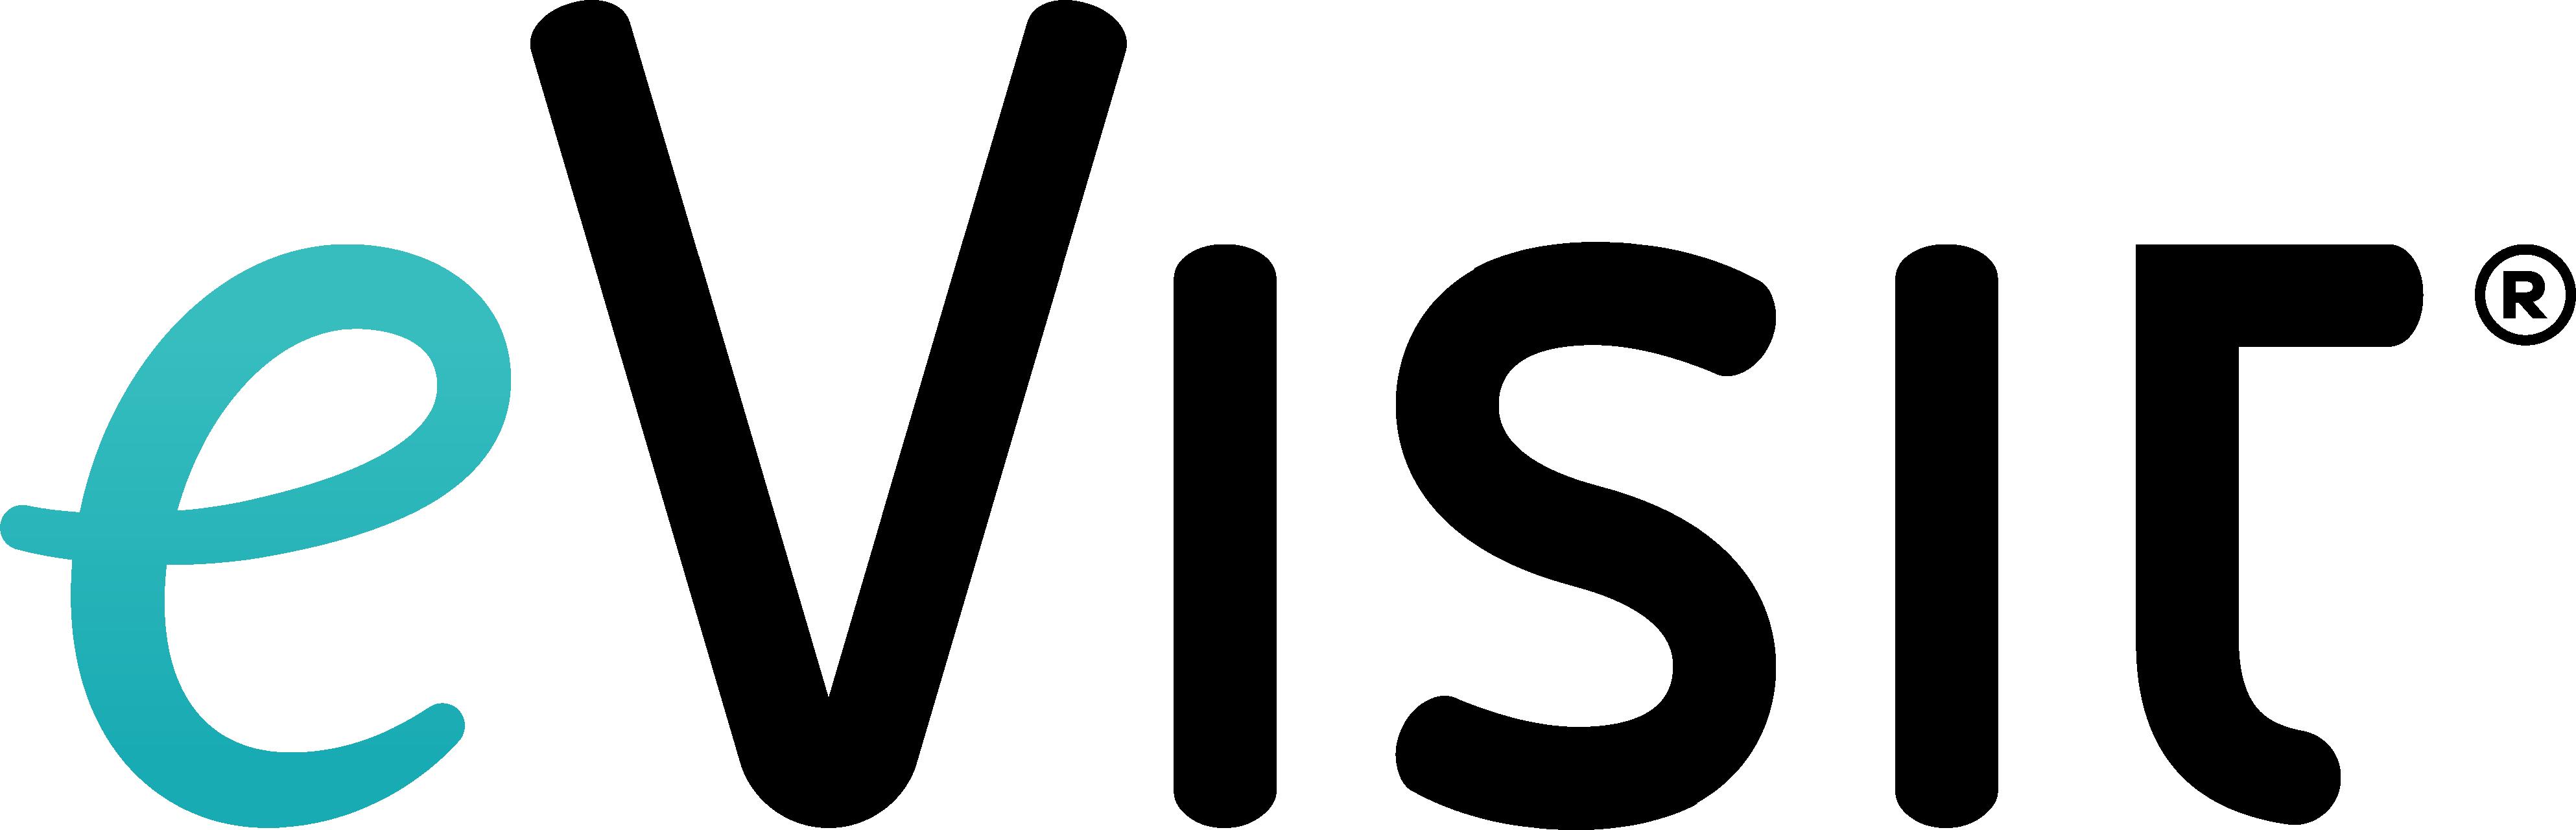 logo-black e-1.png